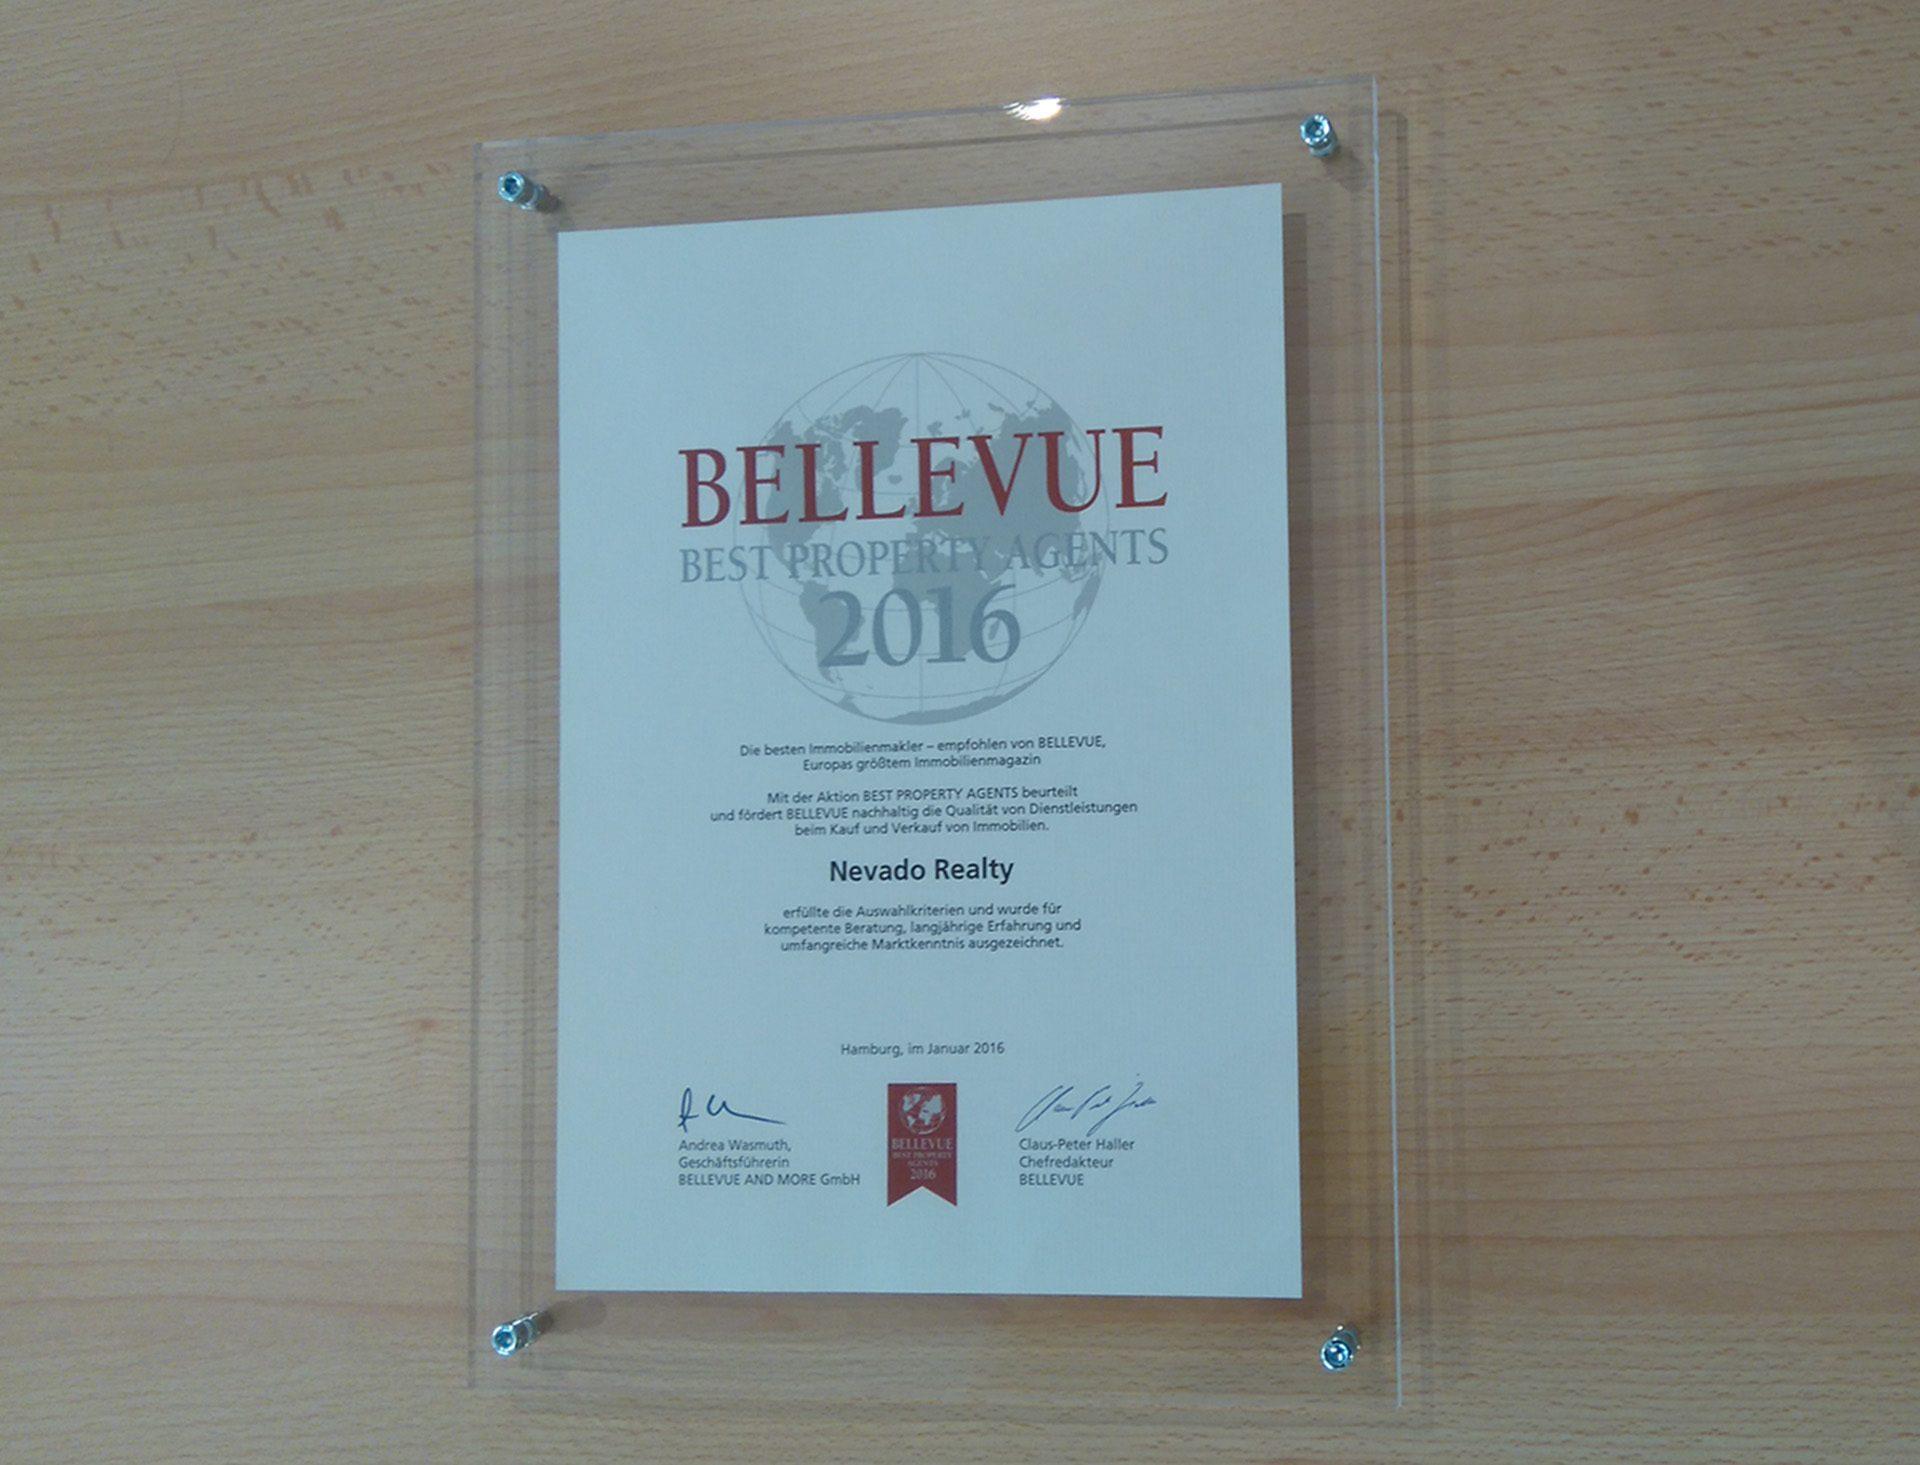 bellevue seal quality nevado realty